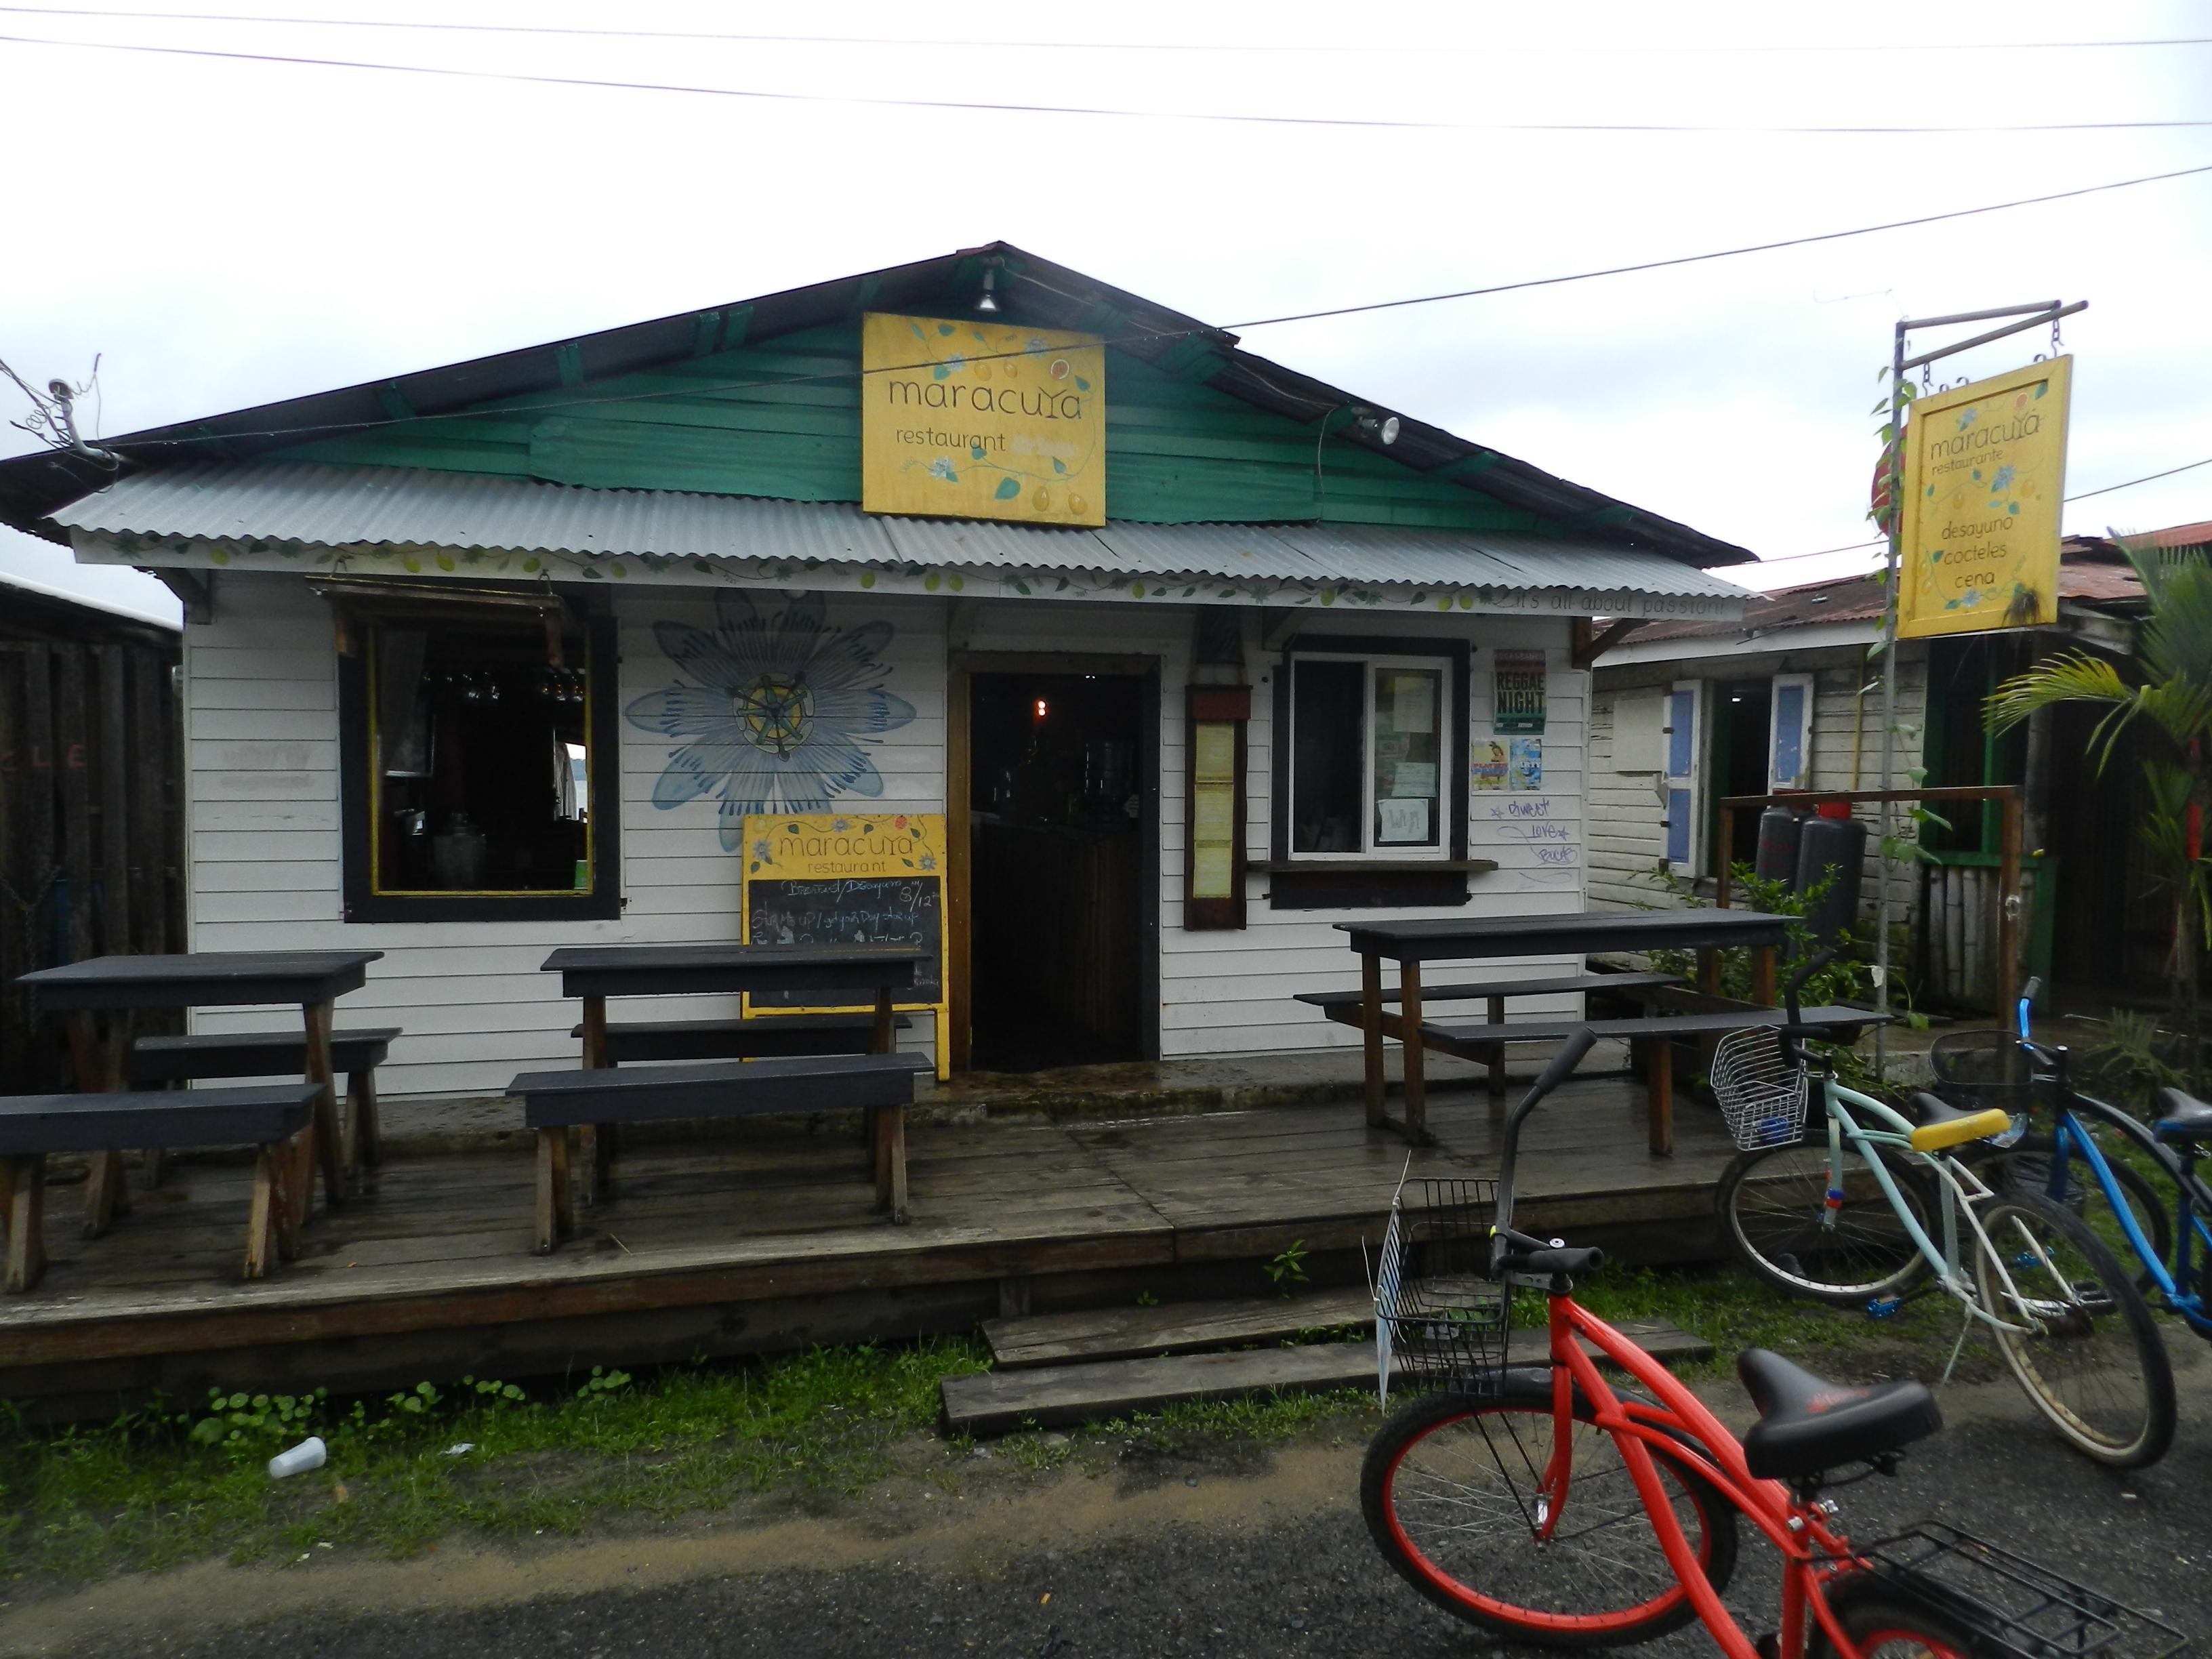 Entrada do Restaurante Maracuya